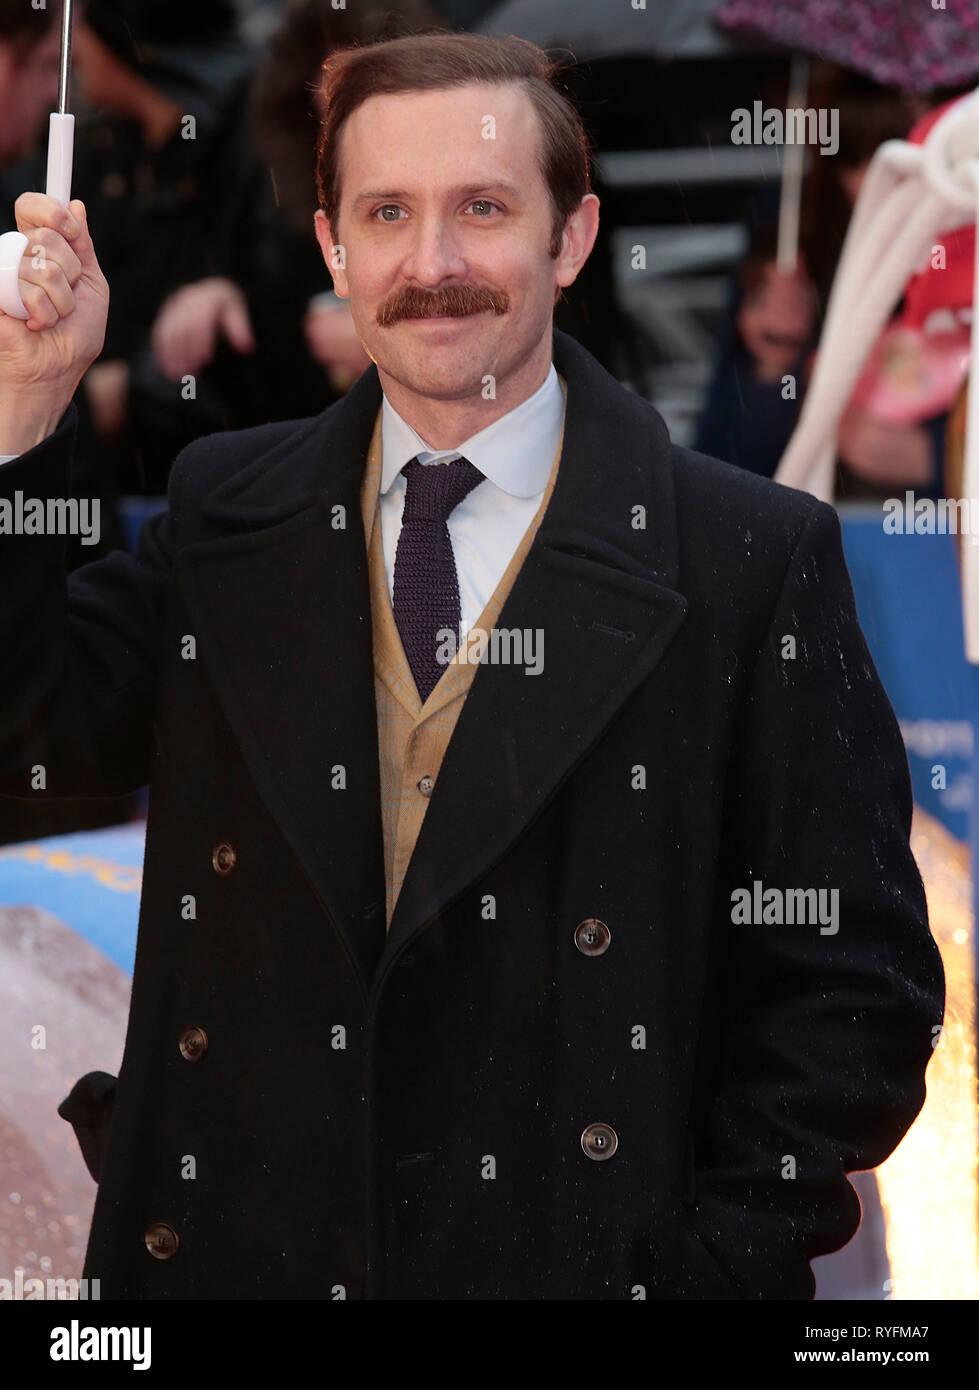 Nov 23, 2014 - London, England, UK - 'Paddington' World Premiere - Red Carpet Arrivals, Odeon, Leicester Square Photo Shows: Guest - Stock Image